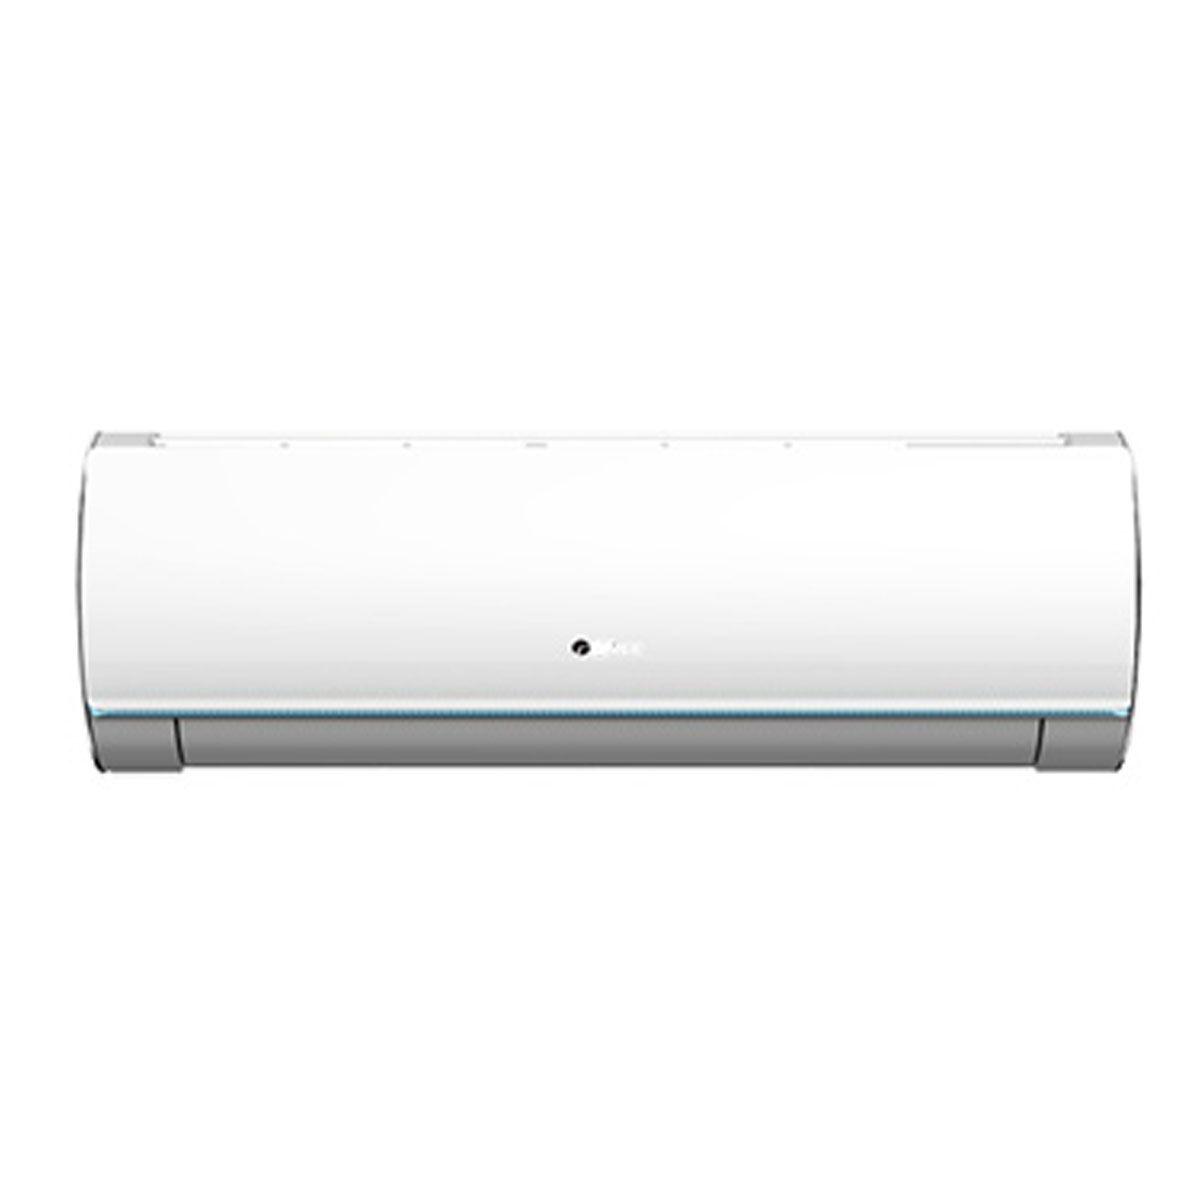 Gree 1.0 Ton Fairy Series Split Inverter AC (GS12FITH2W)